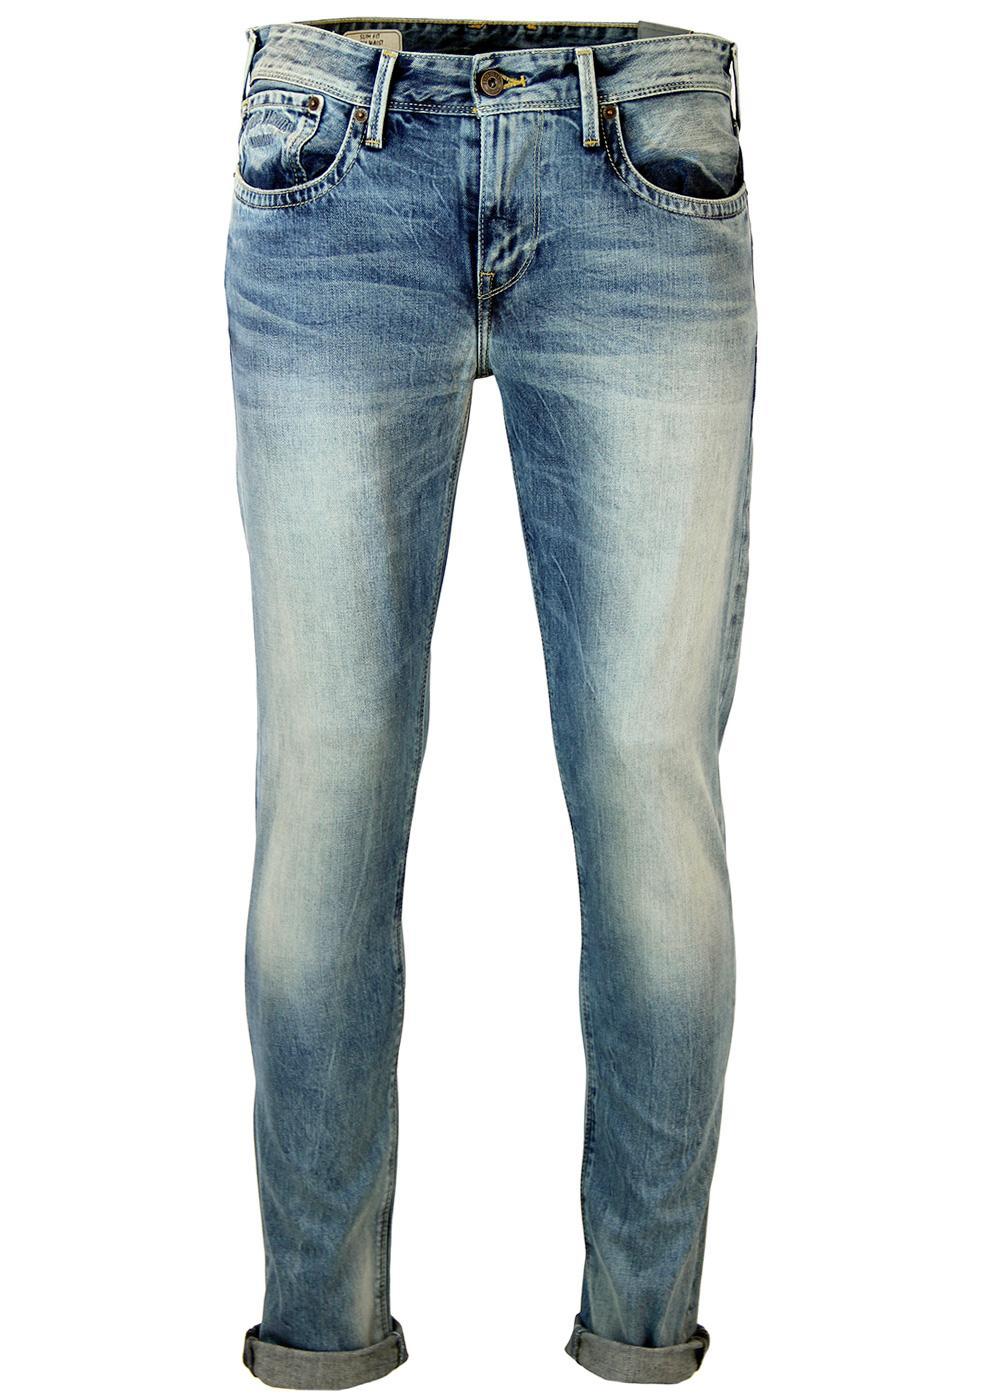 Hatch PEPE JEANS Retro Mod Slim Fit Jeans